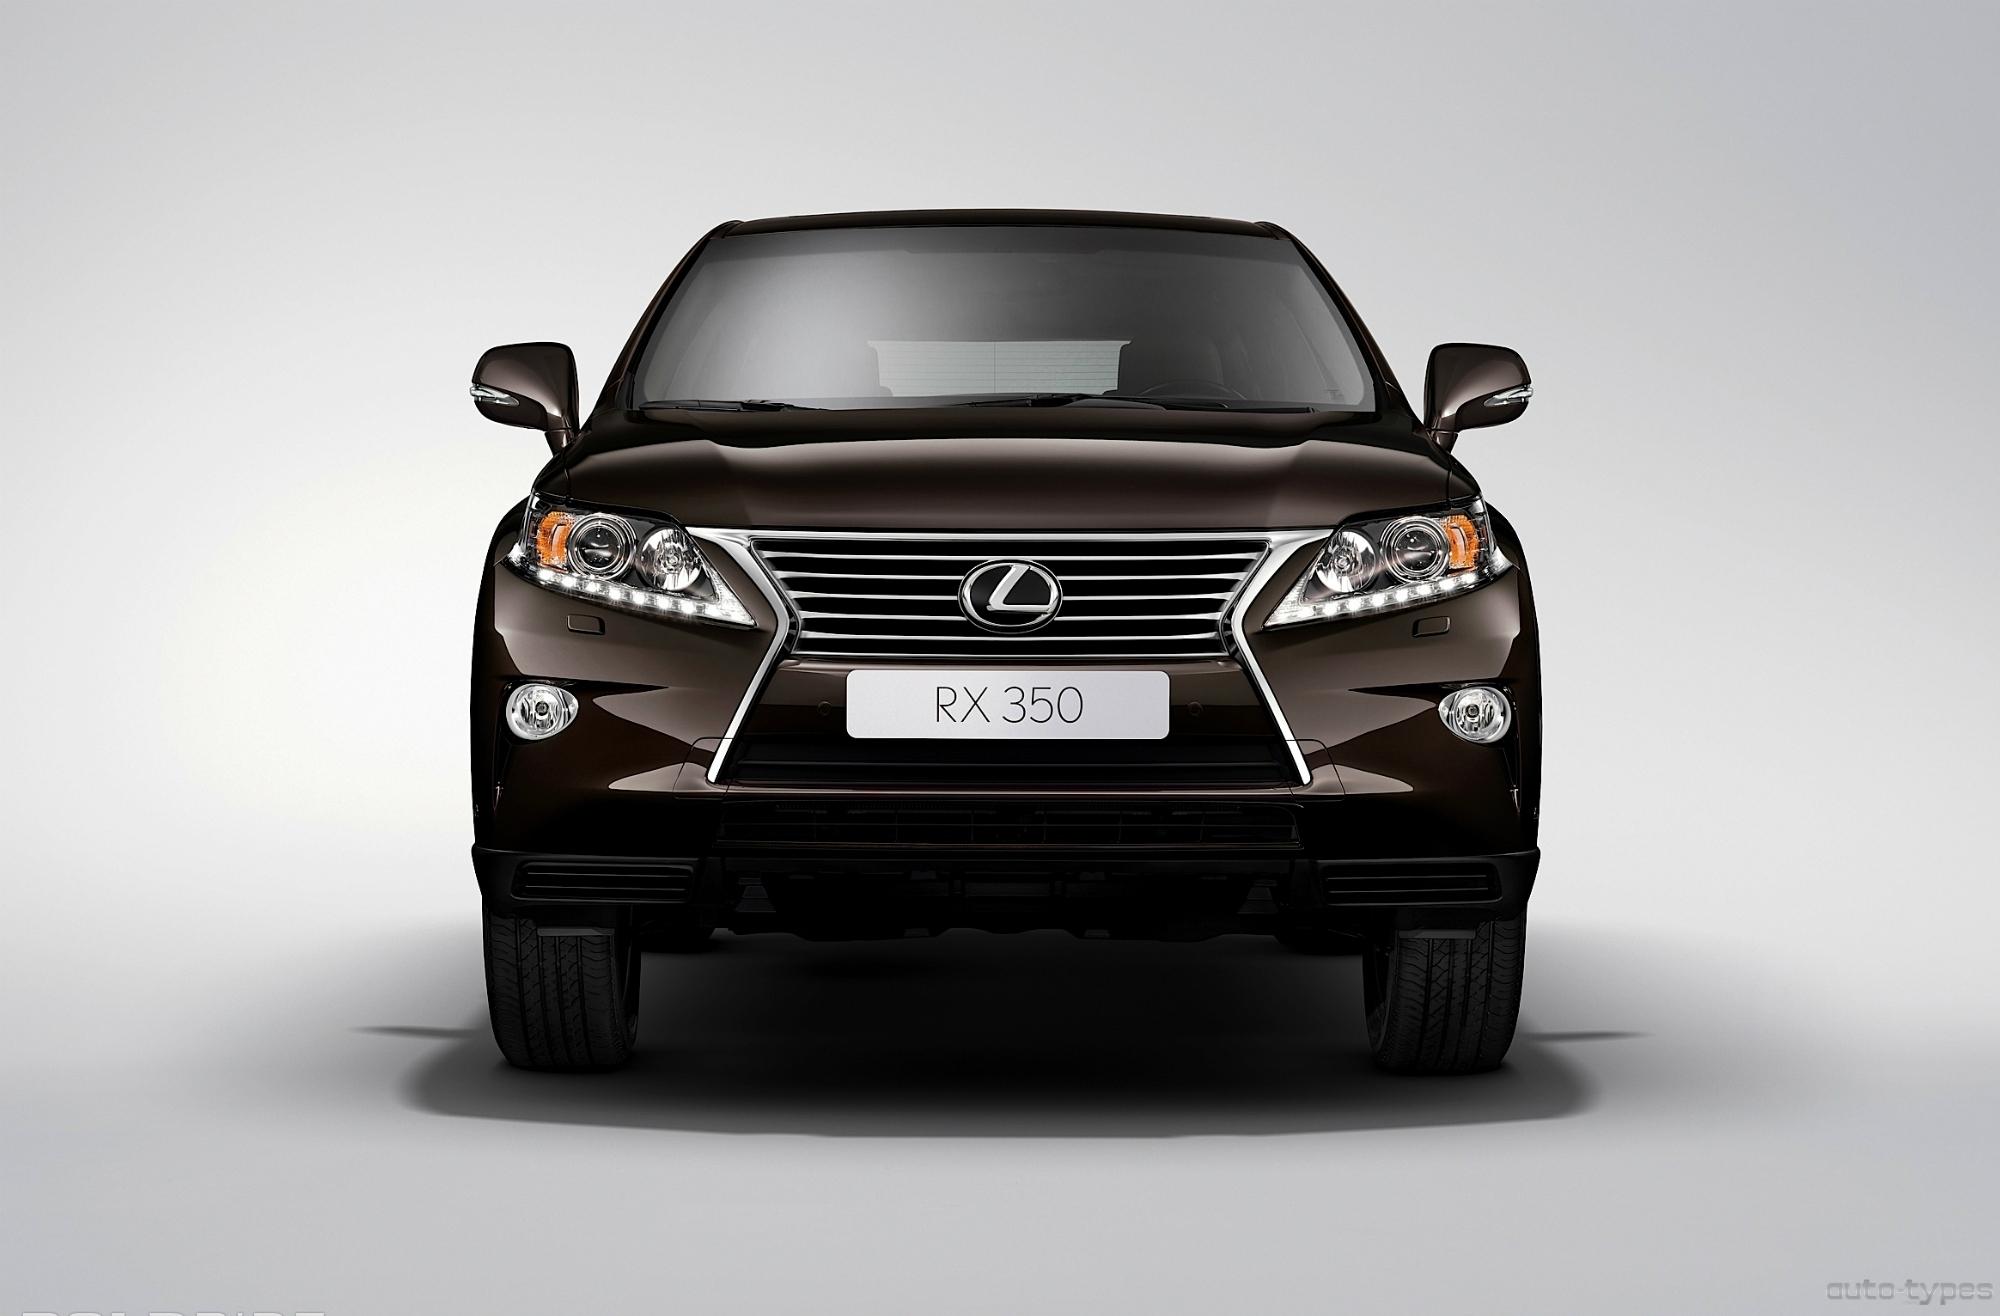 Lexus Is 350 >> 2012 LEXUS RX 350 - Image #15